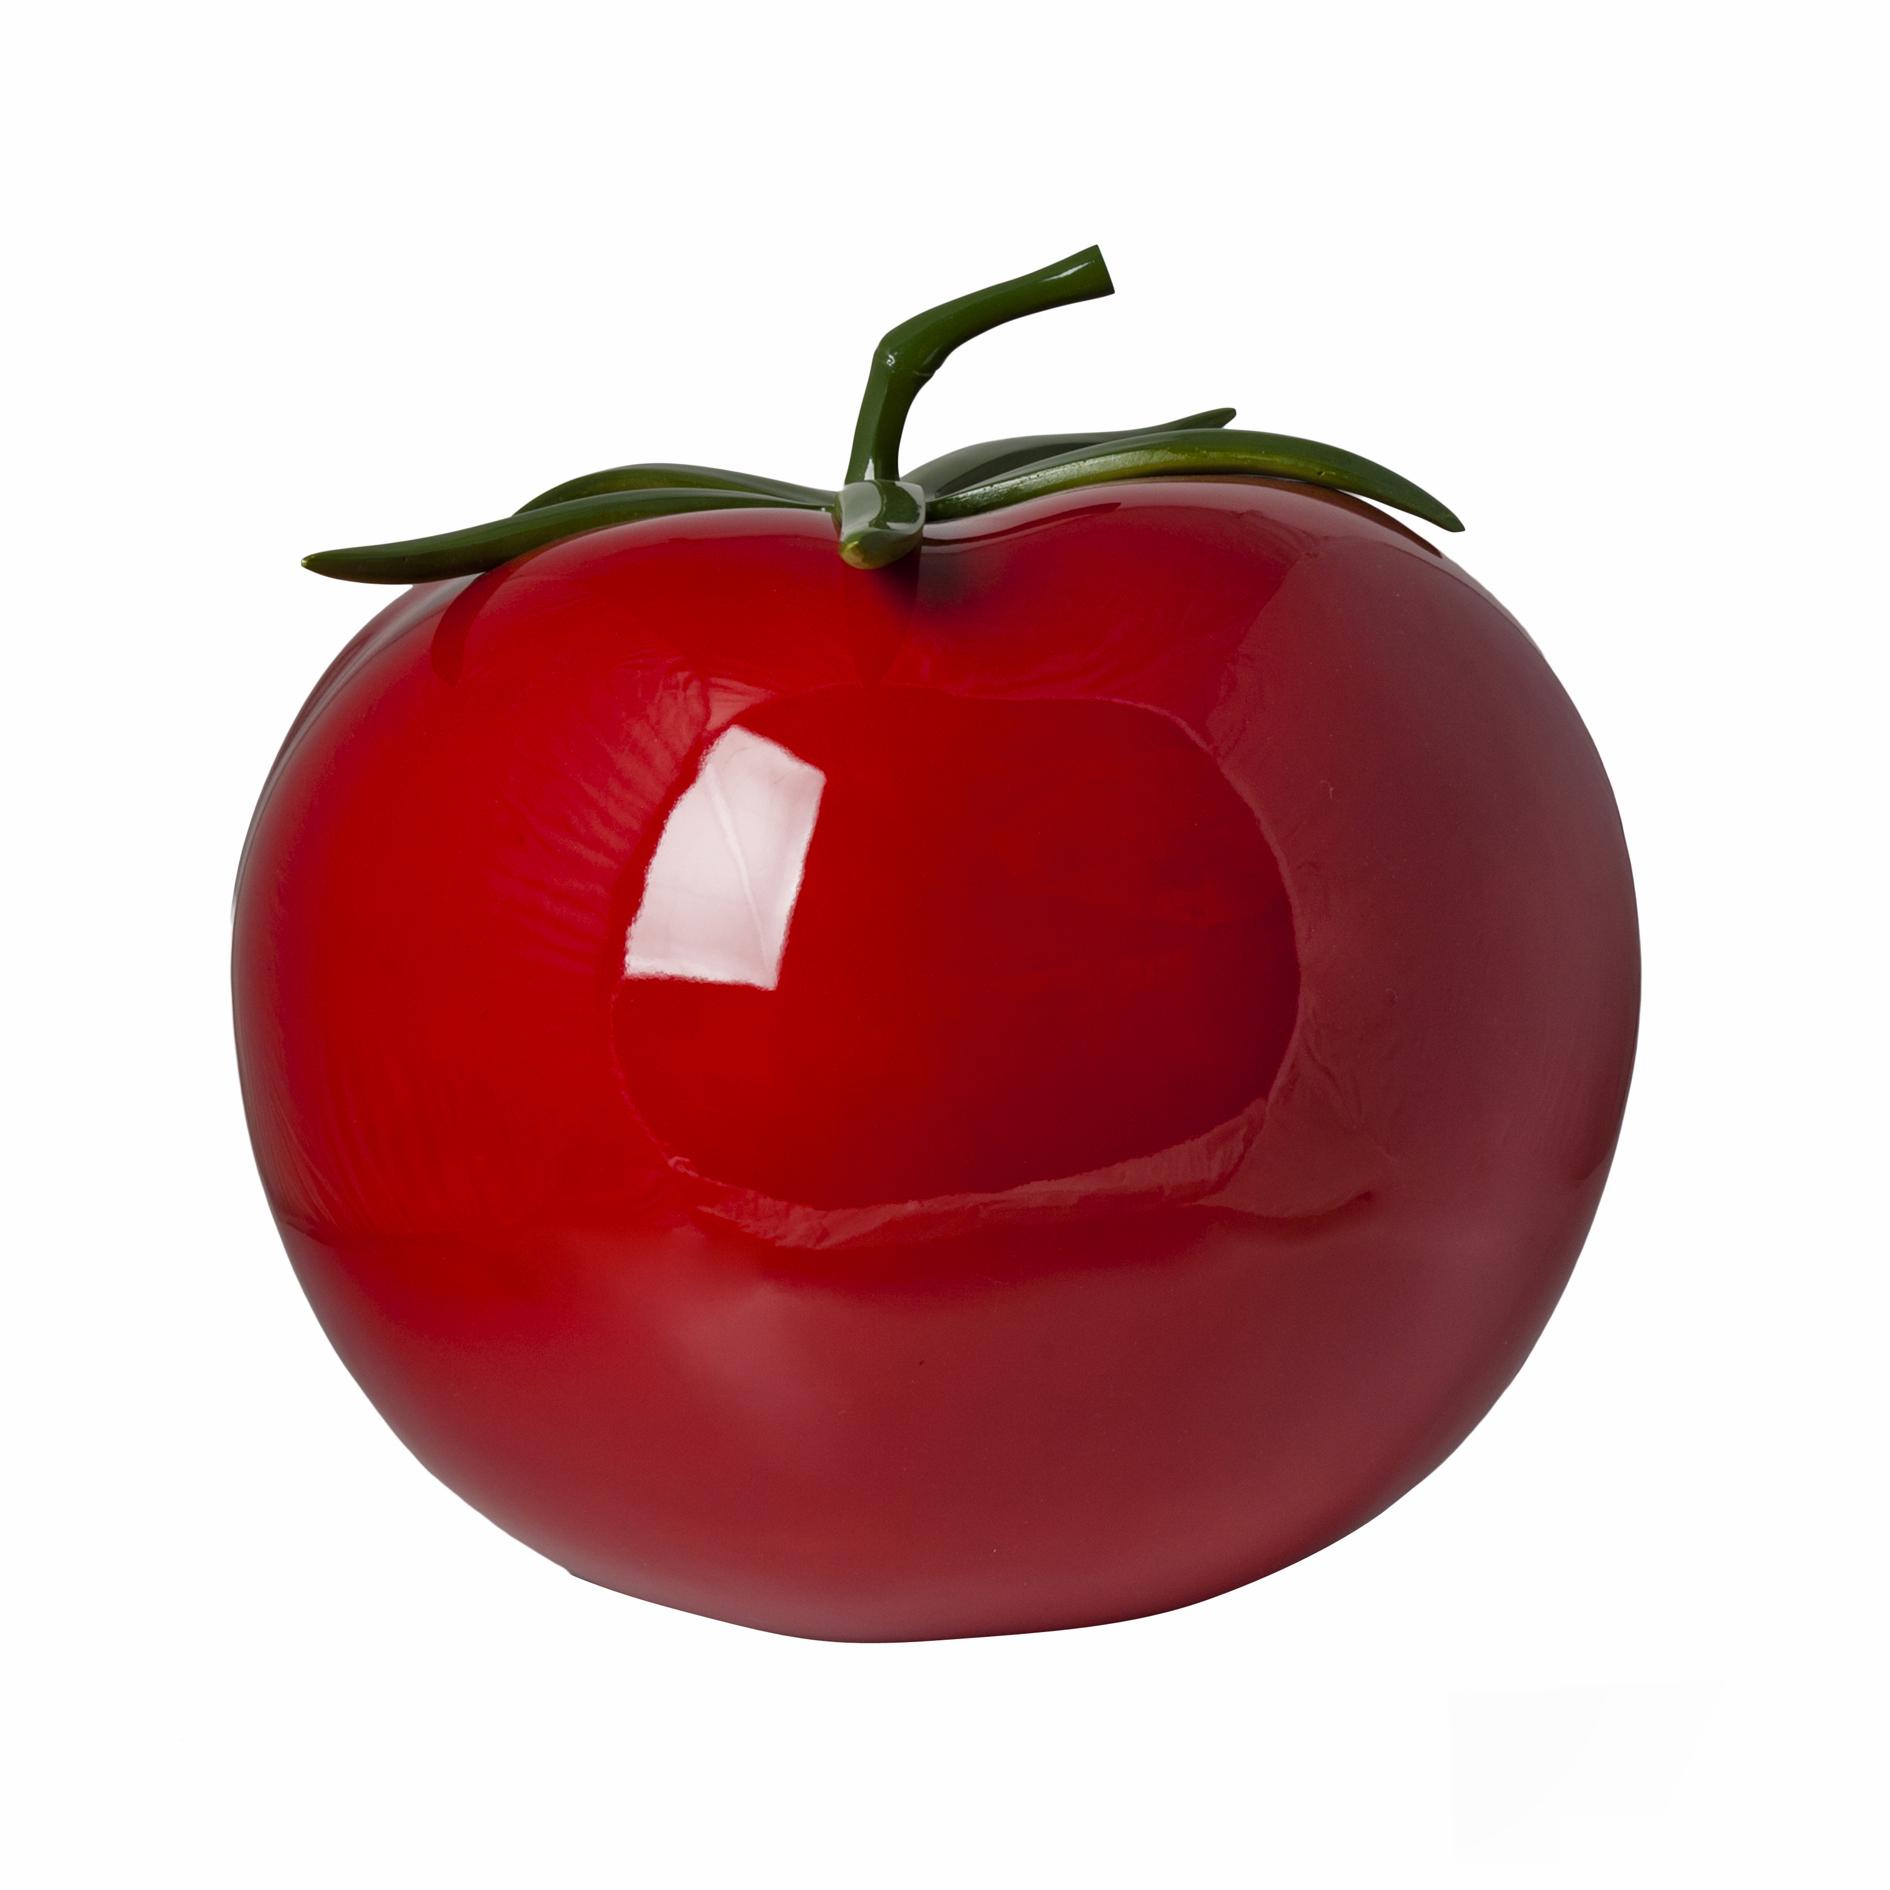 Deko tomate in rot aus robustem fiberglas gr e l e2233 - Fiberglas eigenschaften ...